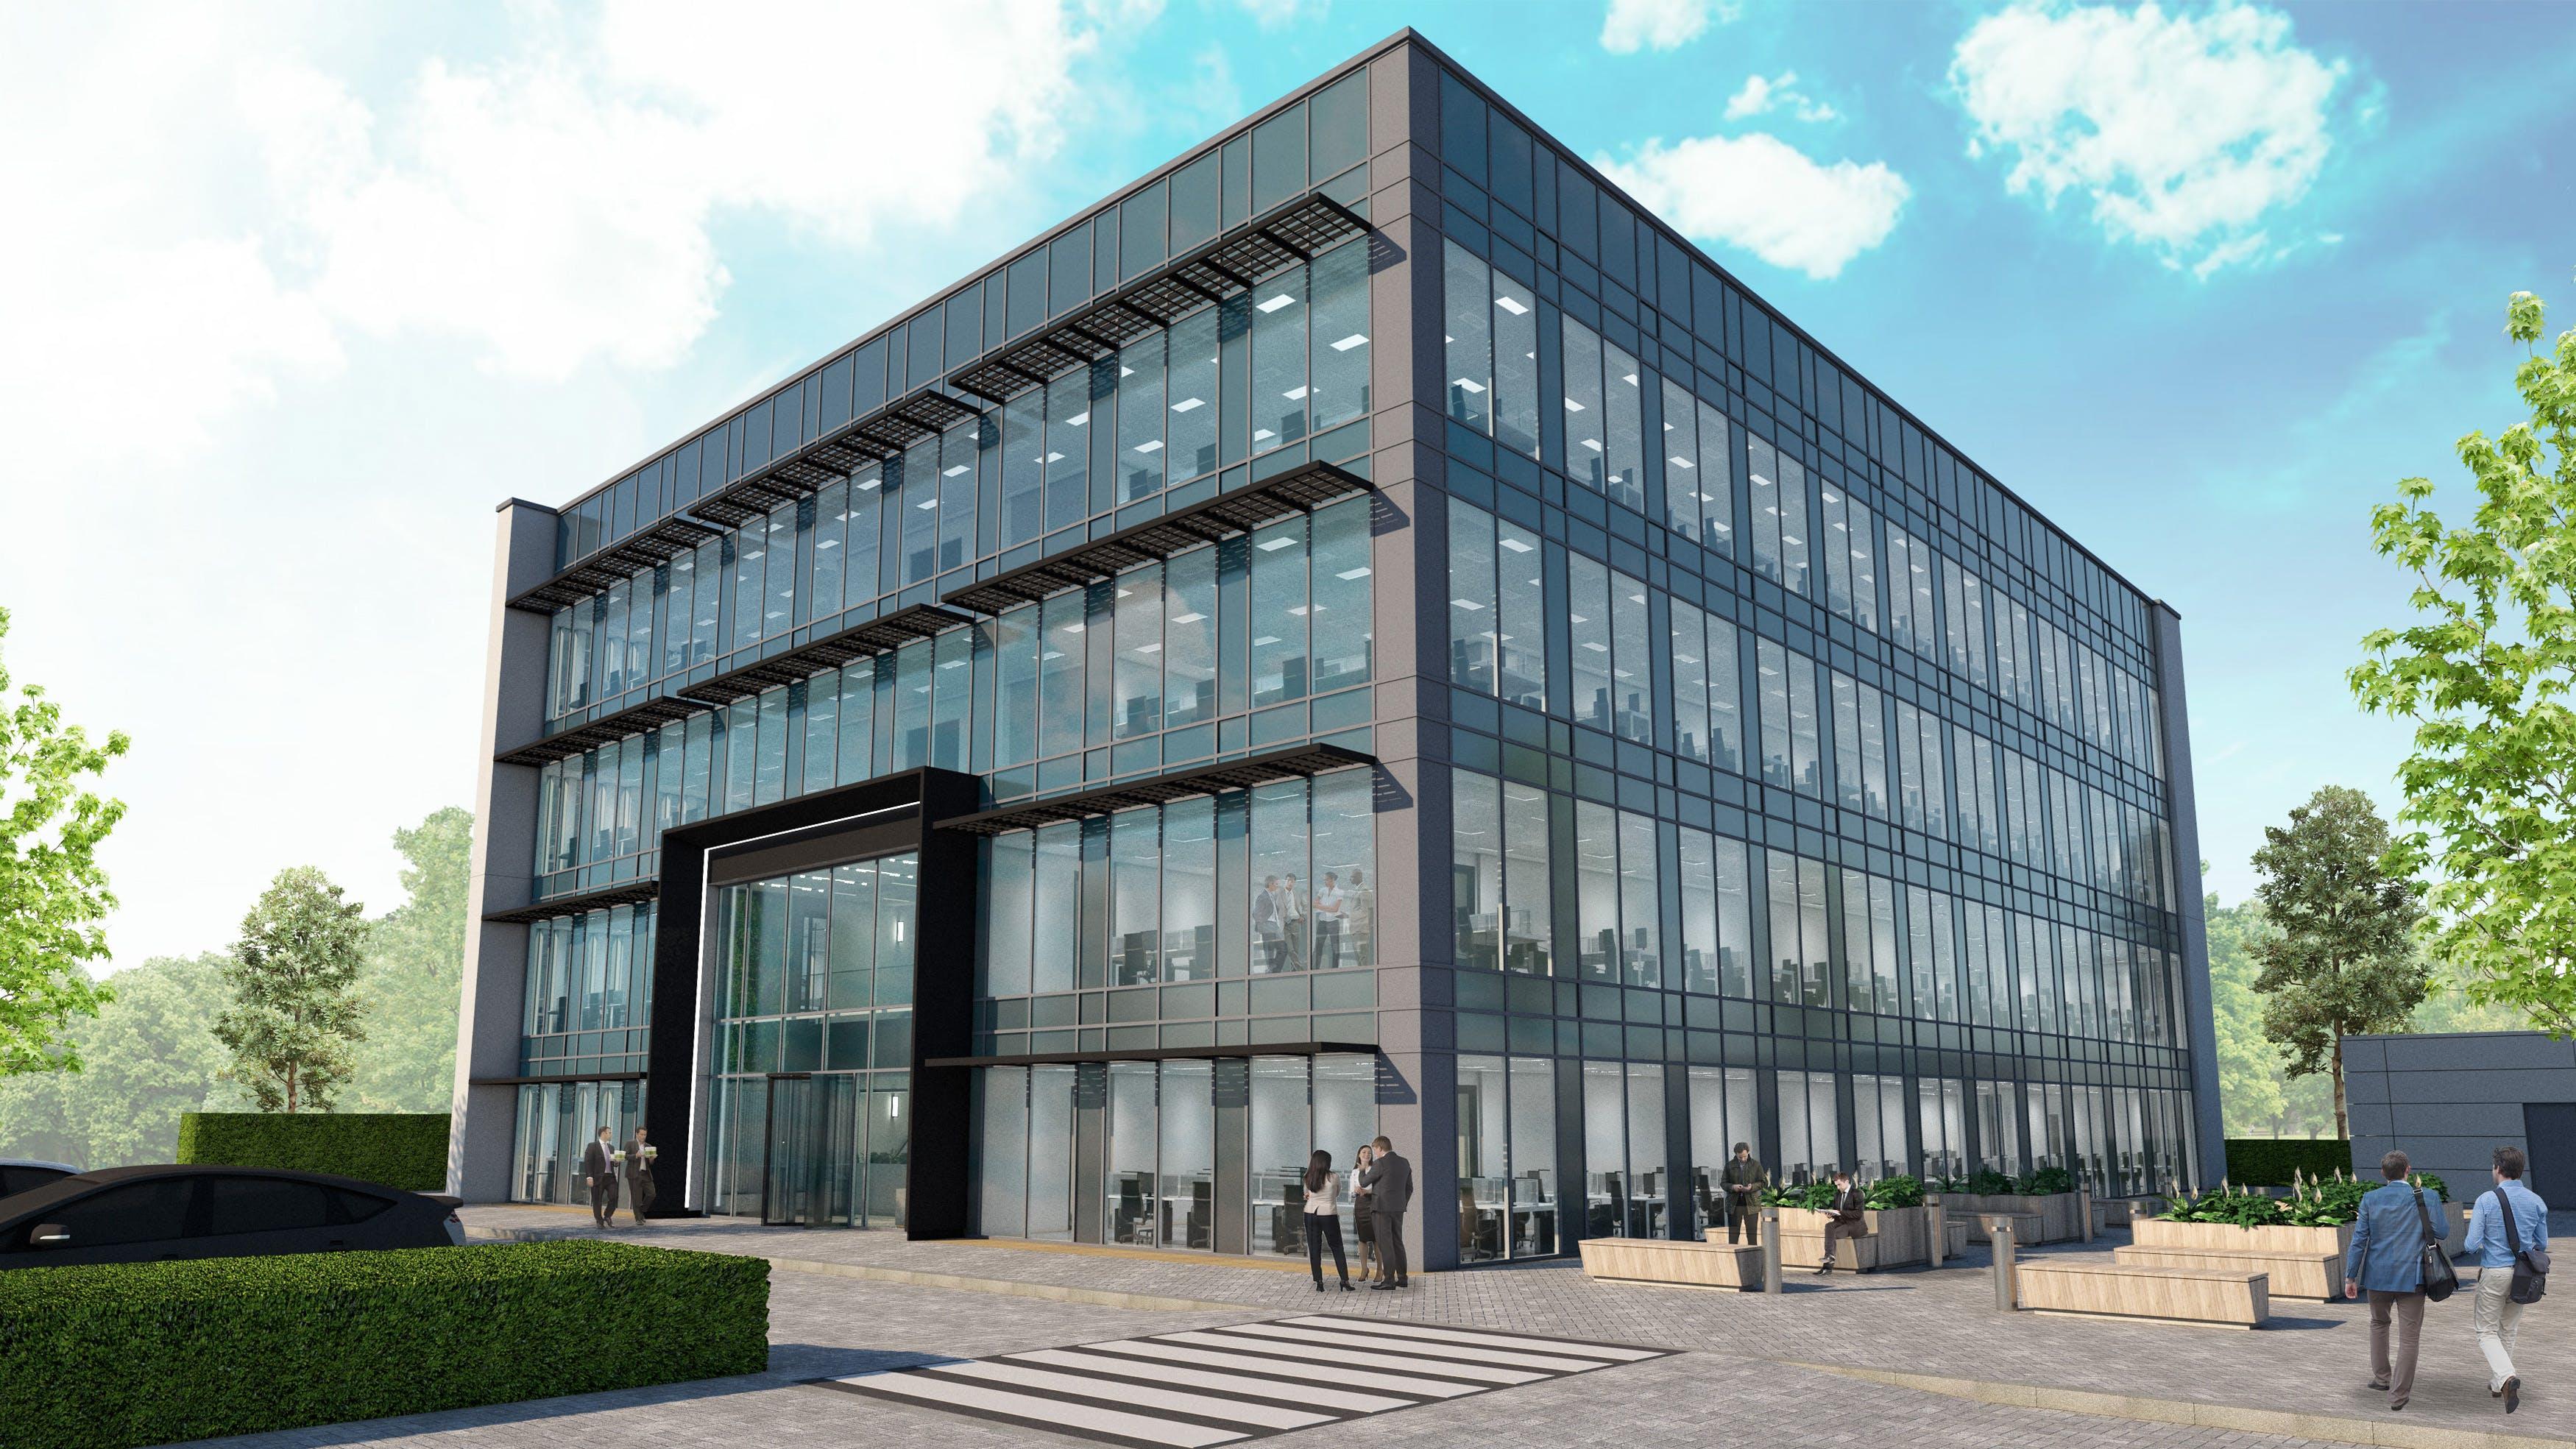 Pinehurst Square 110, Farnborough Business Park, Farnborough, Offices To Let - 110 External View.jpg